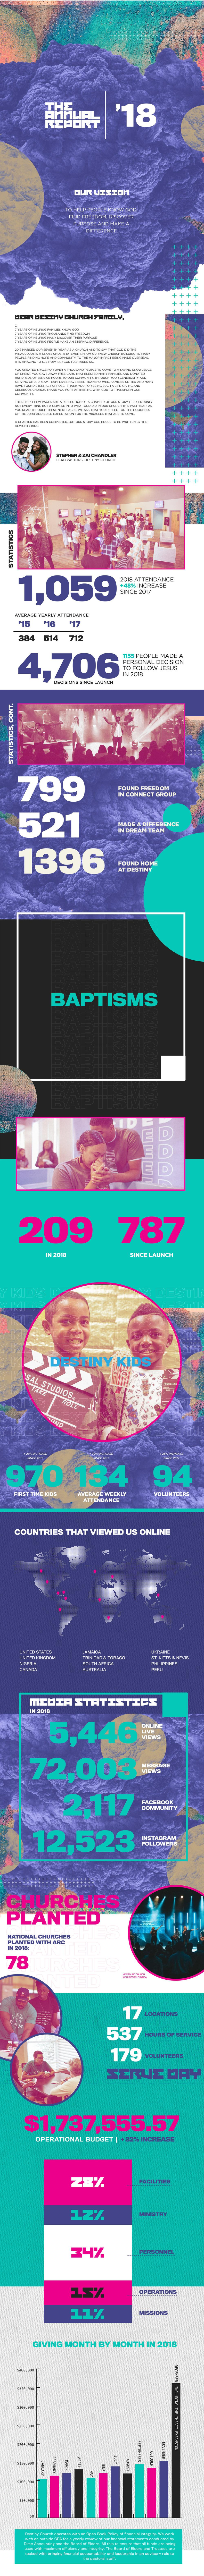 Annual Report-01.jpg